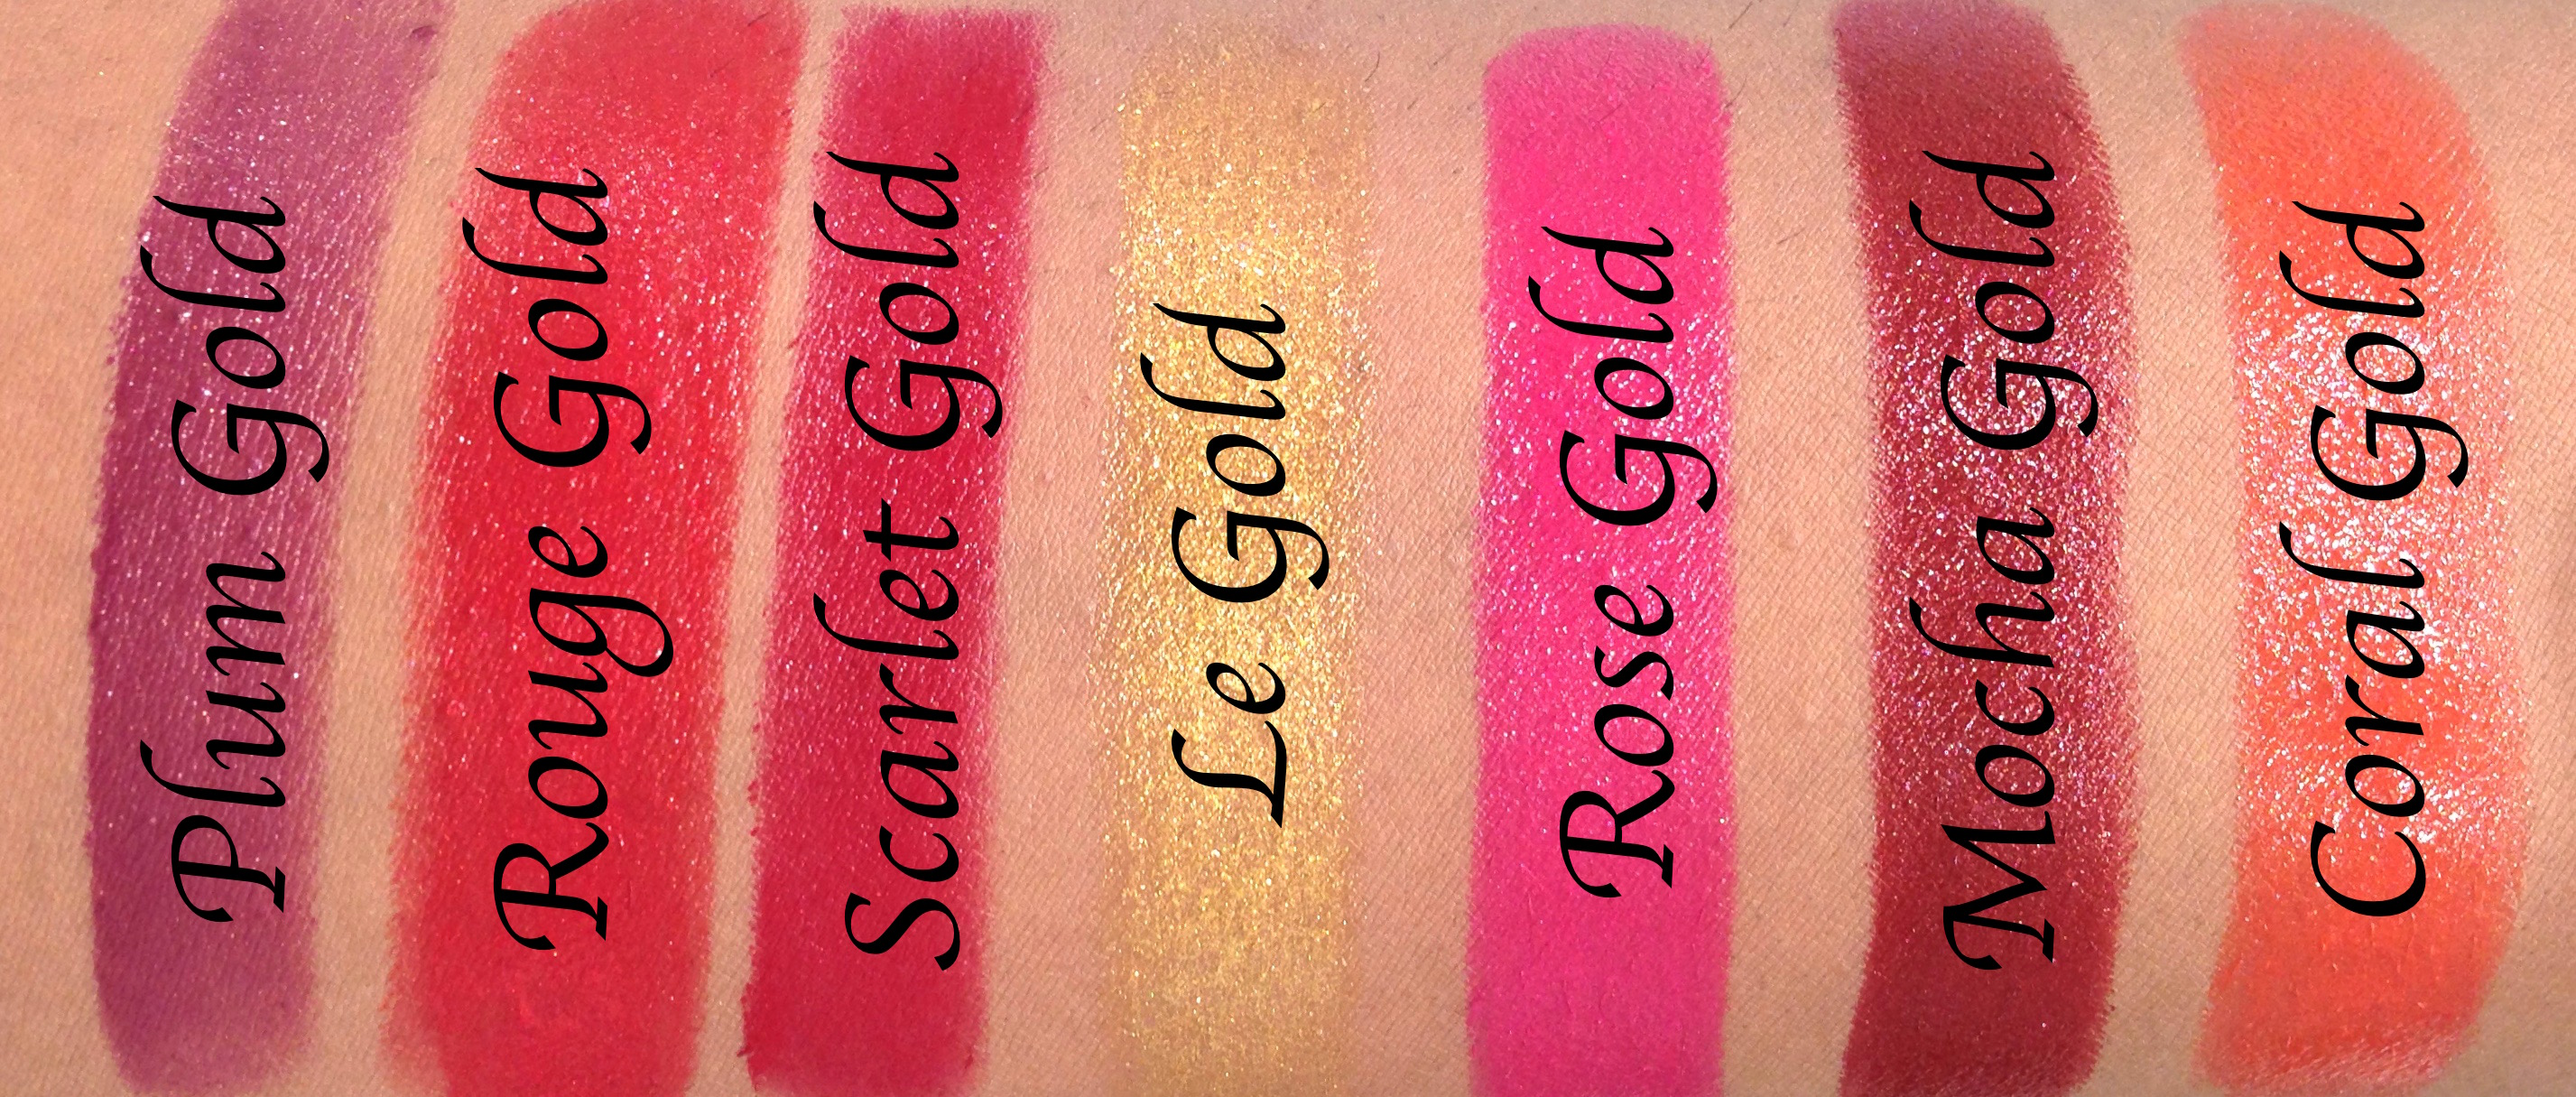 Gold Addiction Satin Lipstick by L'Oreal #19